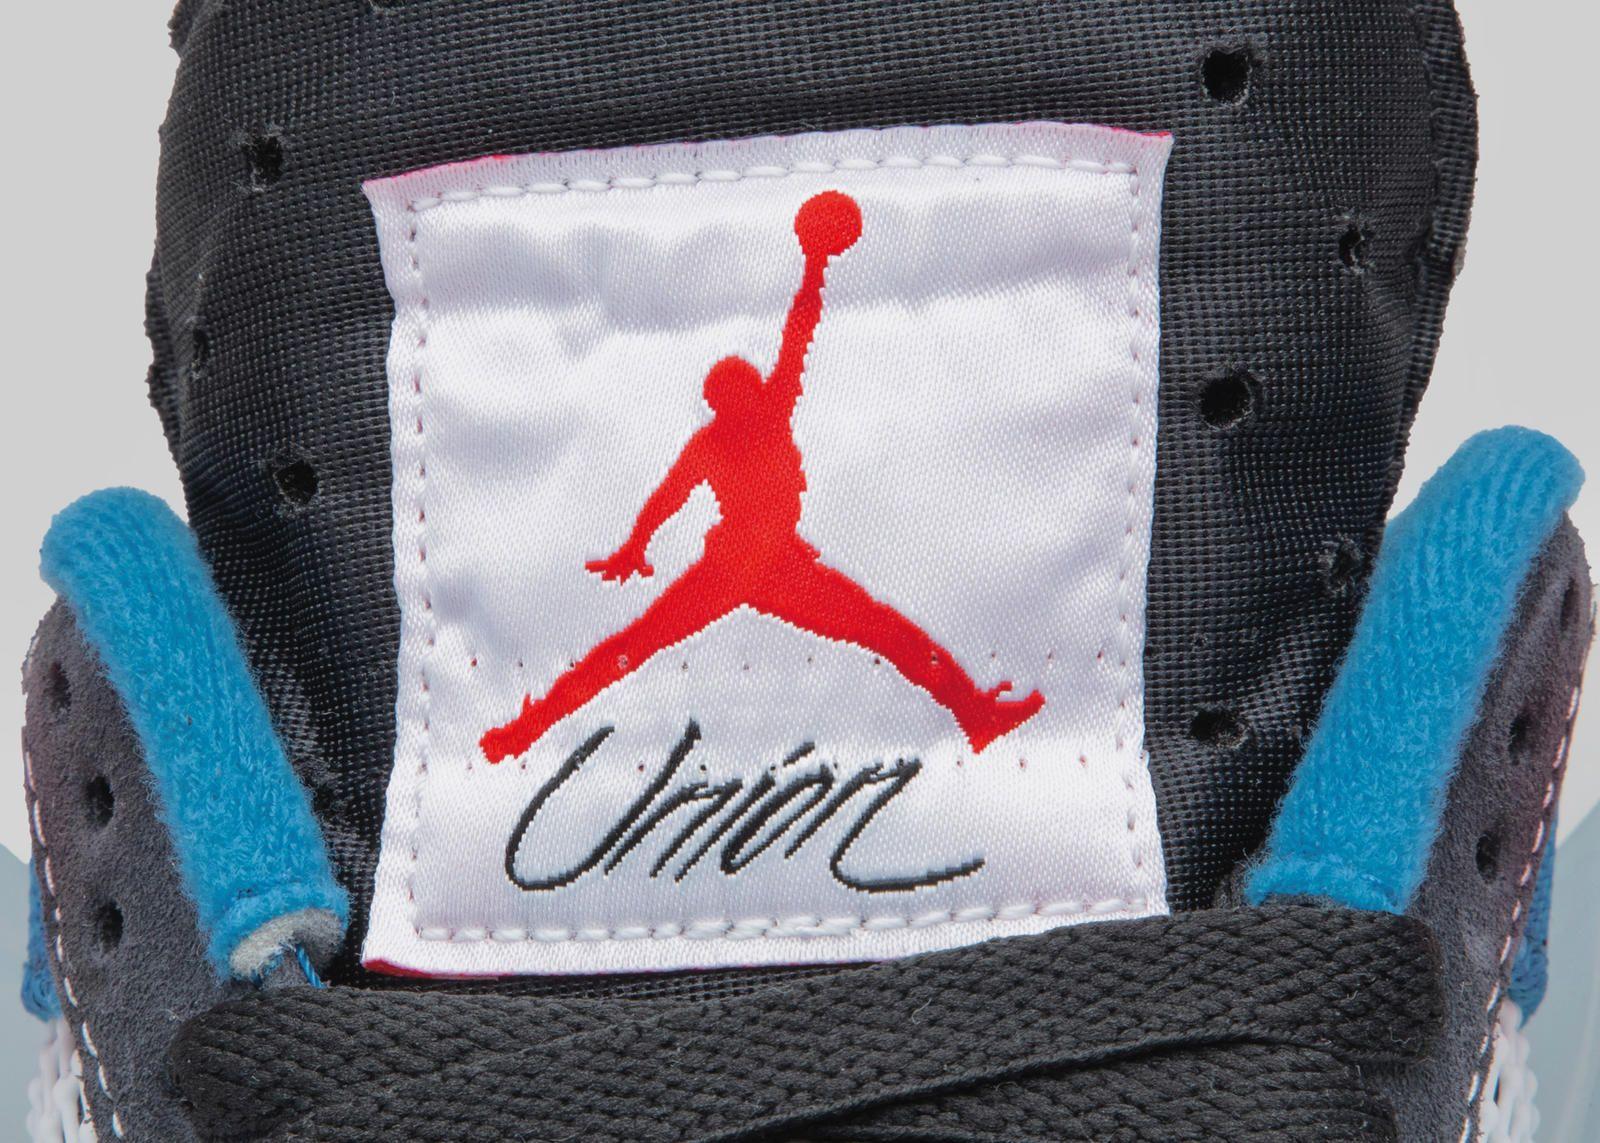 Union x Air Jordan 4 Off Noir